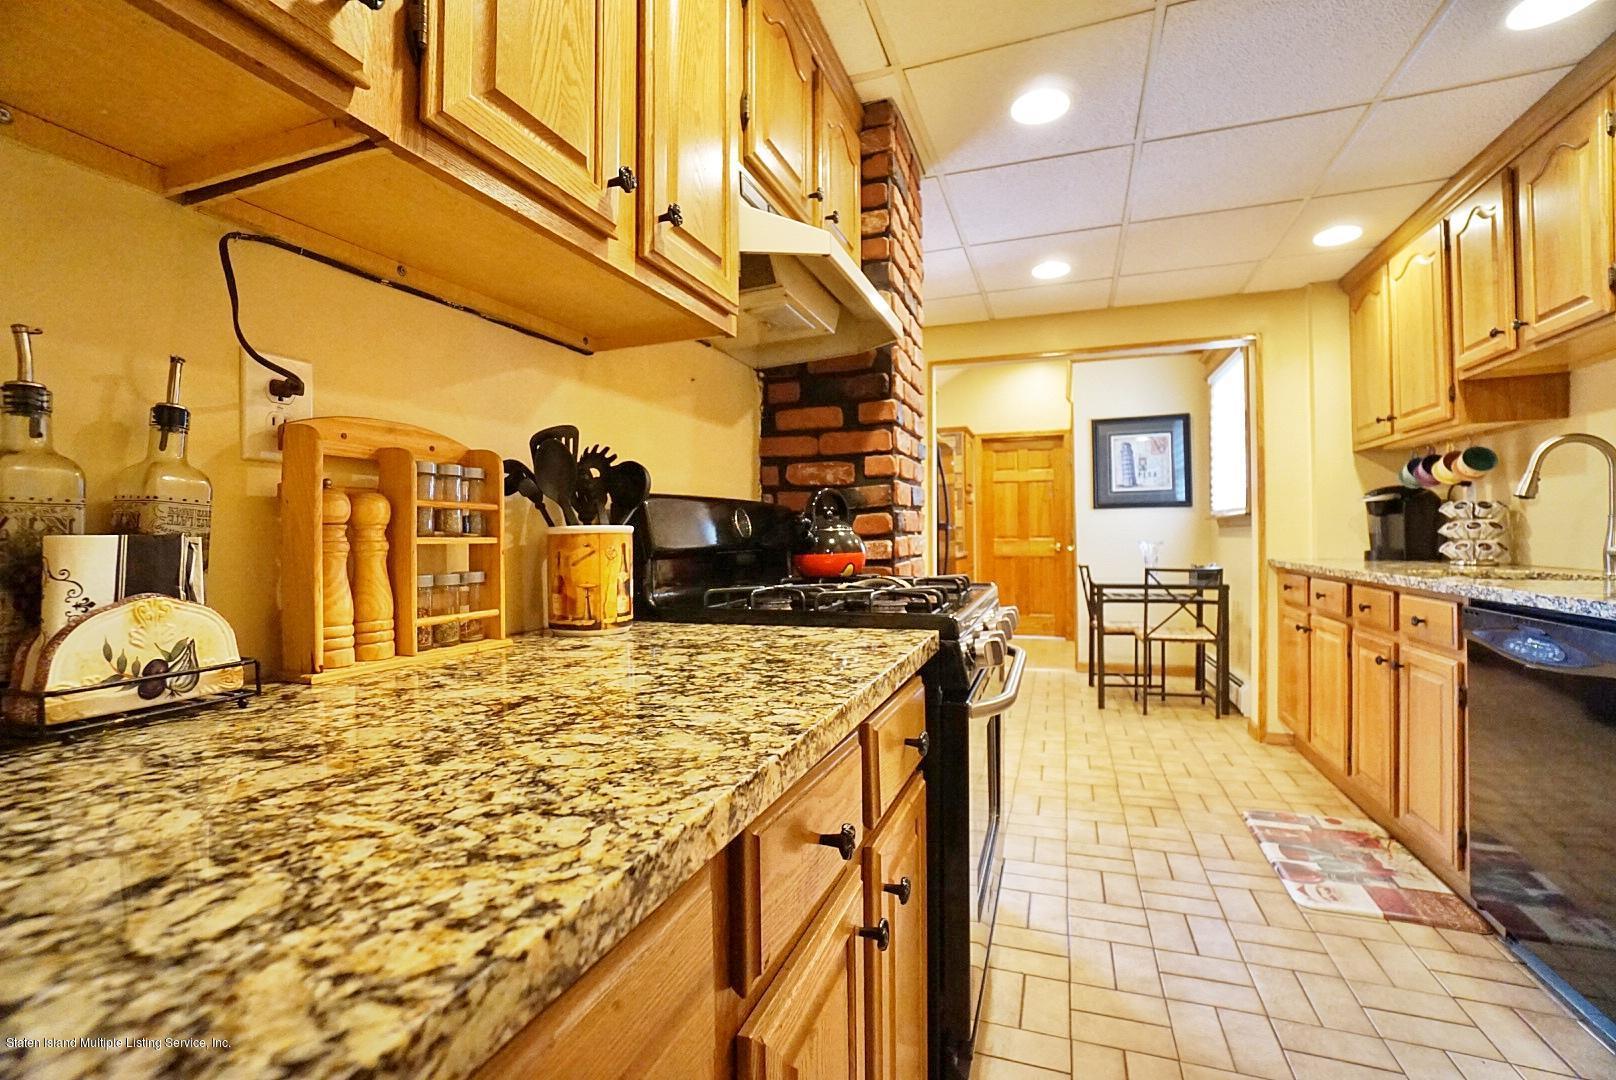 Single Family - Detached 22 Maine Avenue  Staten Island, NY 10314, MLS-1128323-8